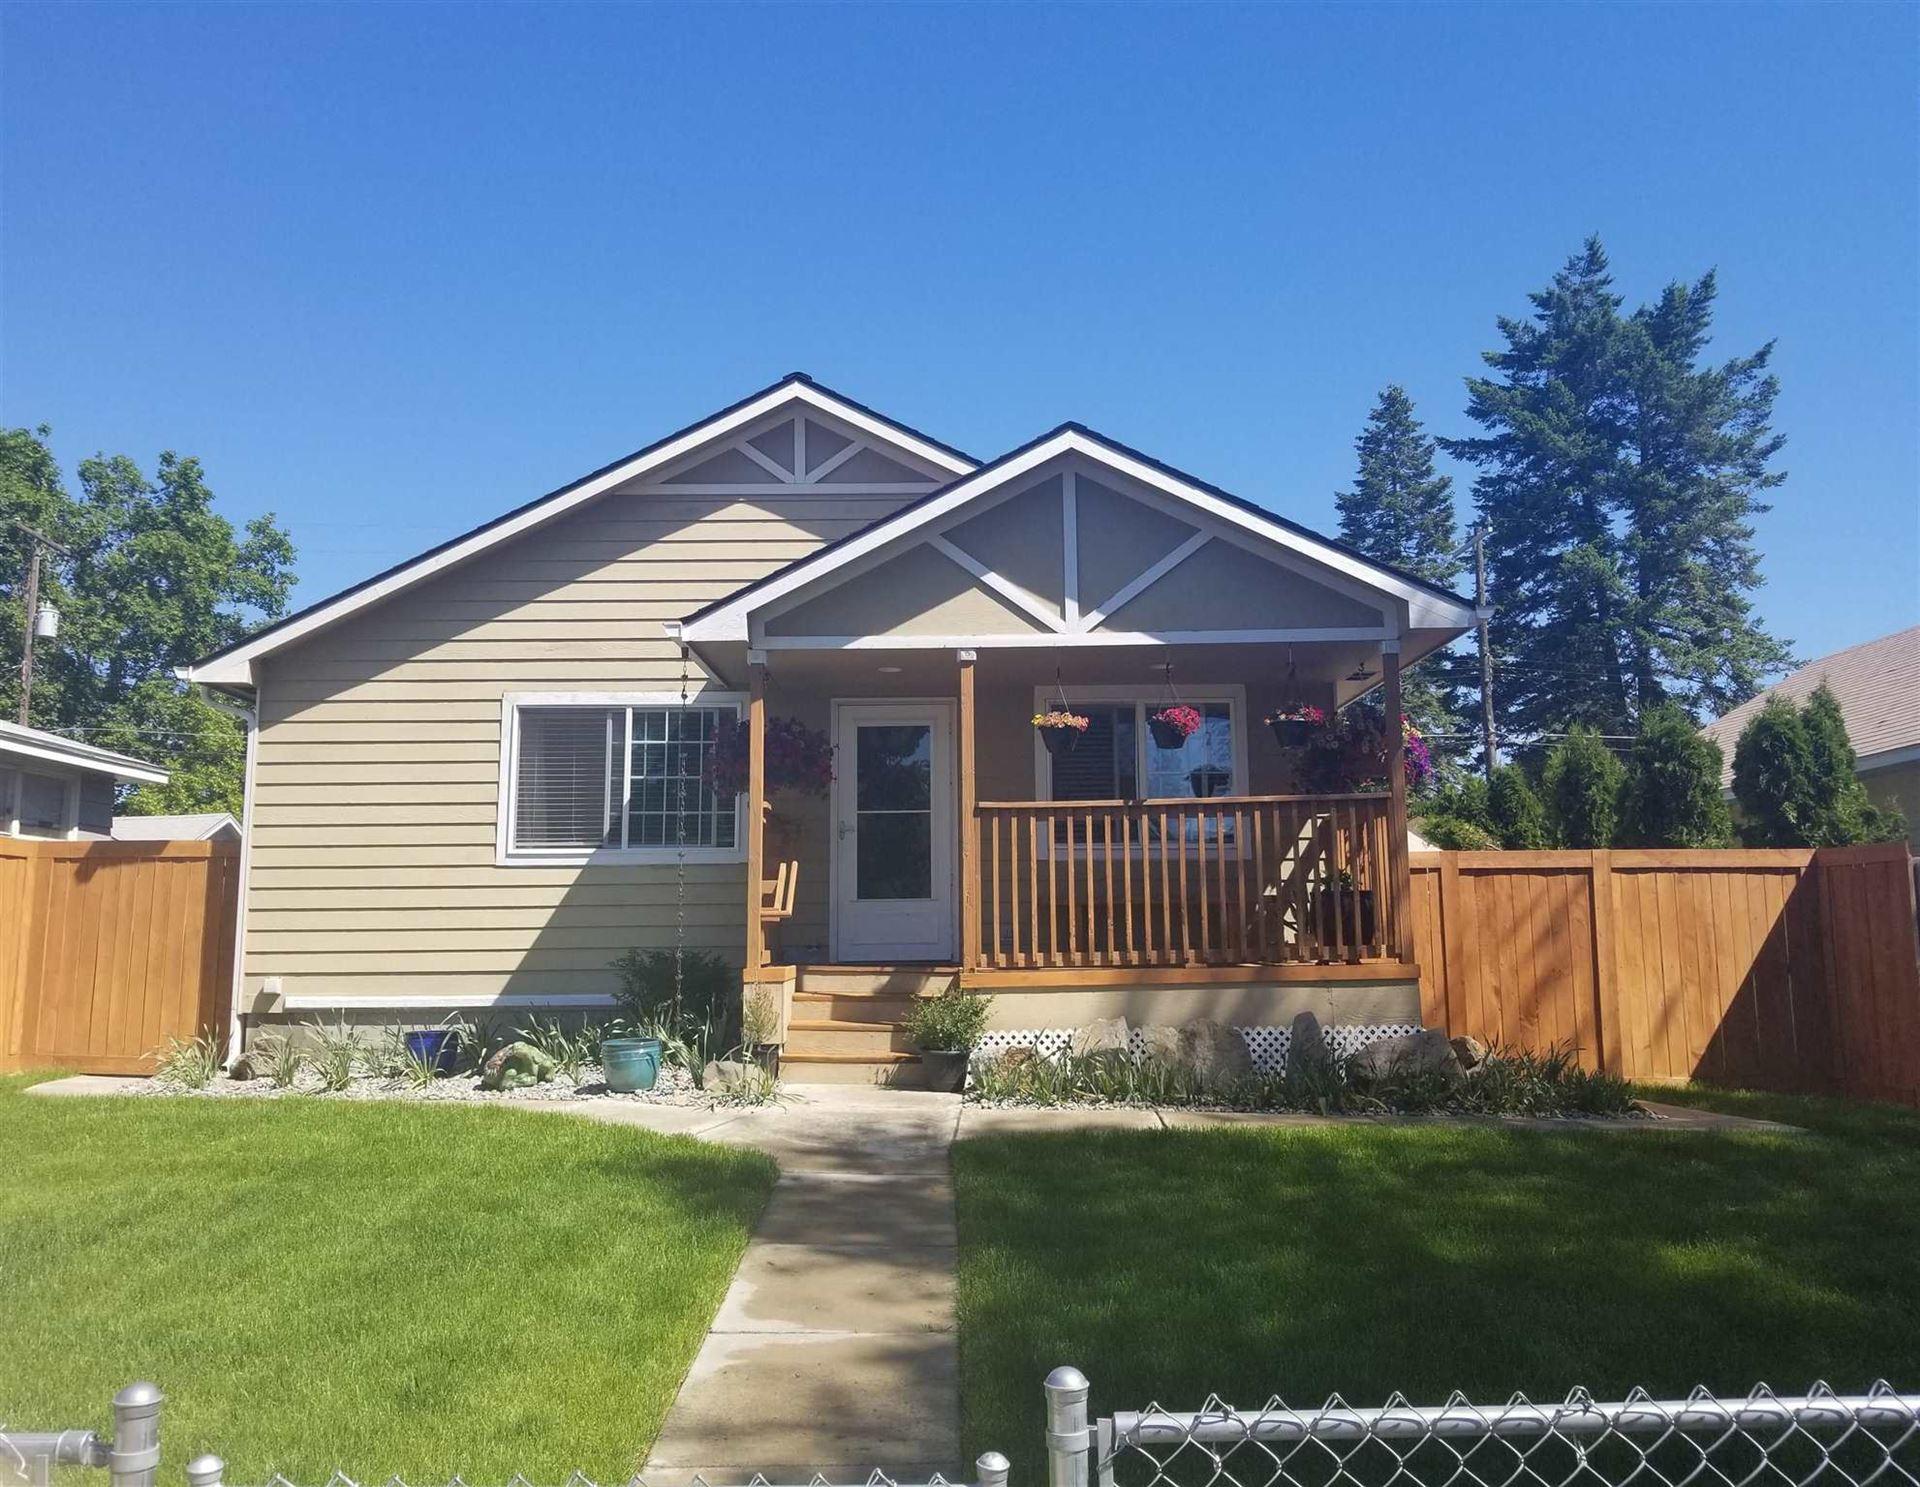 711 E Rockwell Ave, Spokane, WA 99207 - #: 202116651